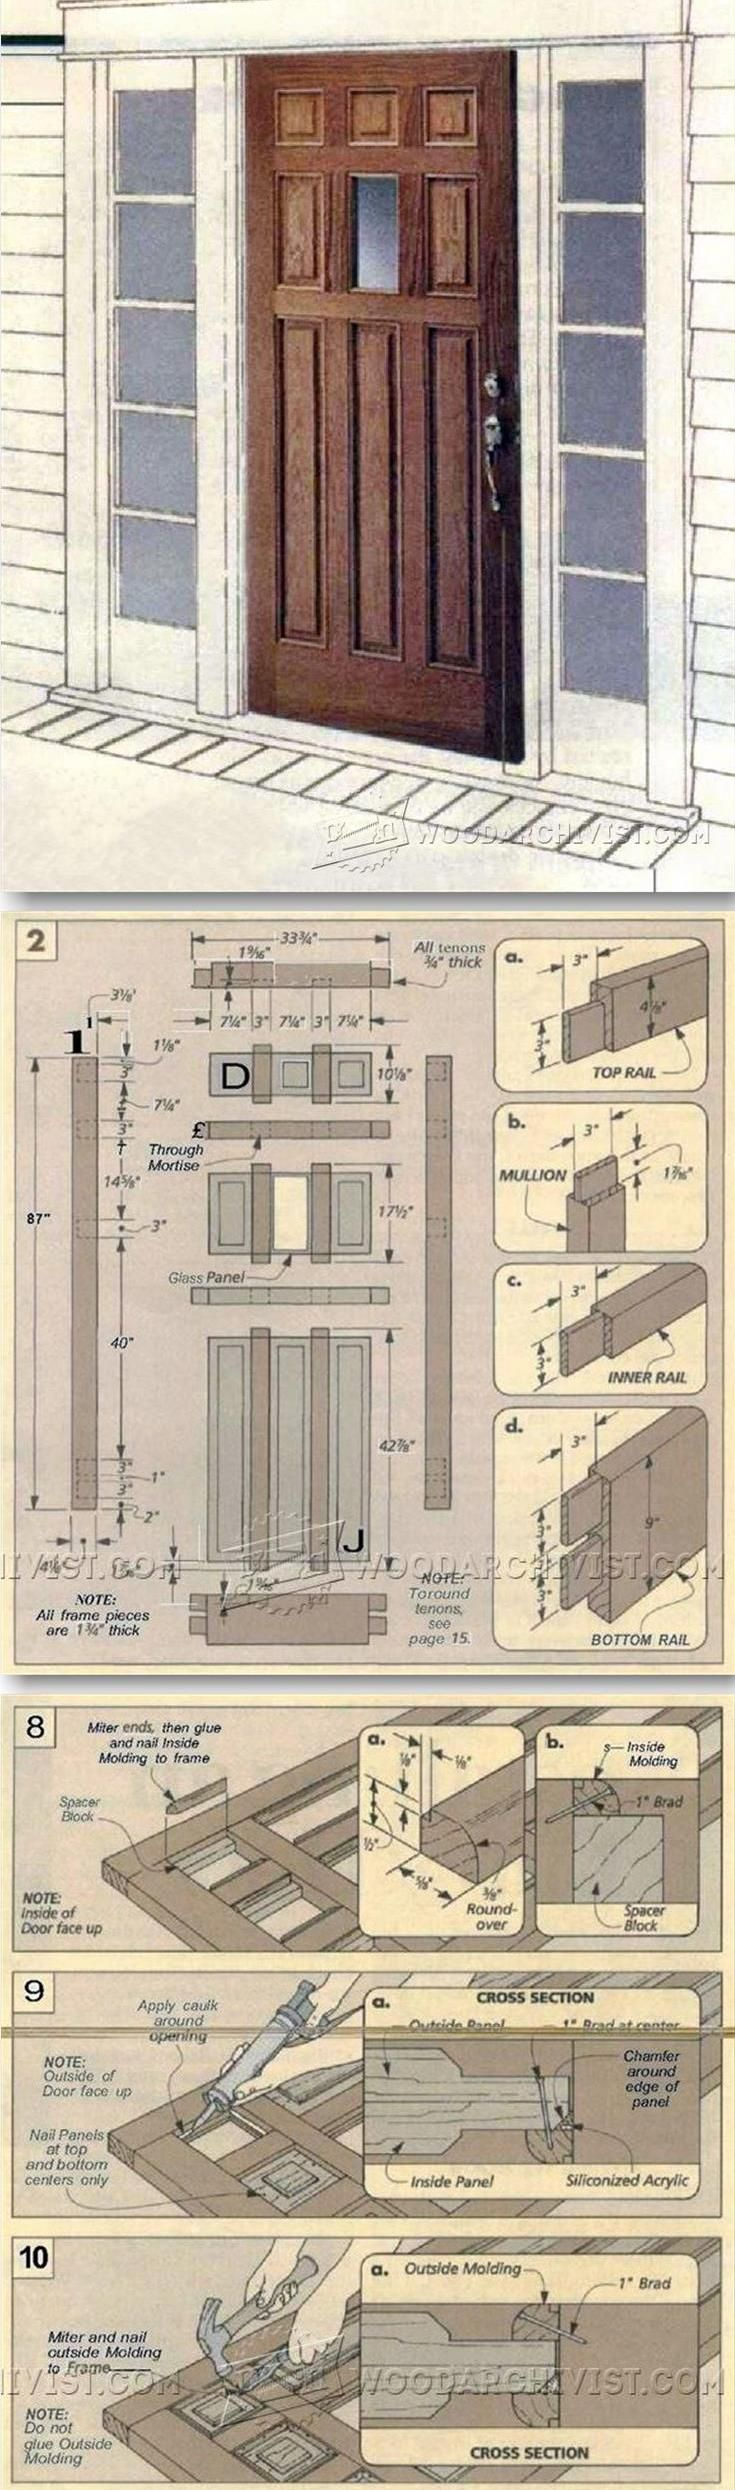 Making Raised Panel Entry Doors Door Construction And Techniques Woodarchivist Com Woodworking Woodworking Projects That Sell Woodworking Plans